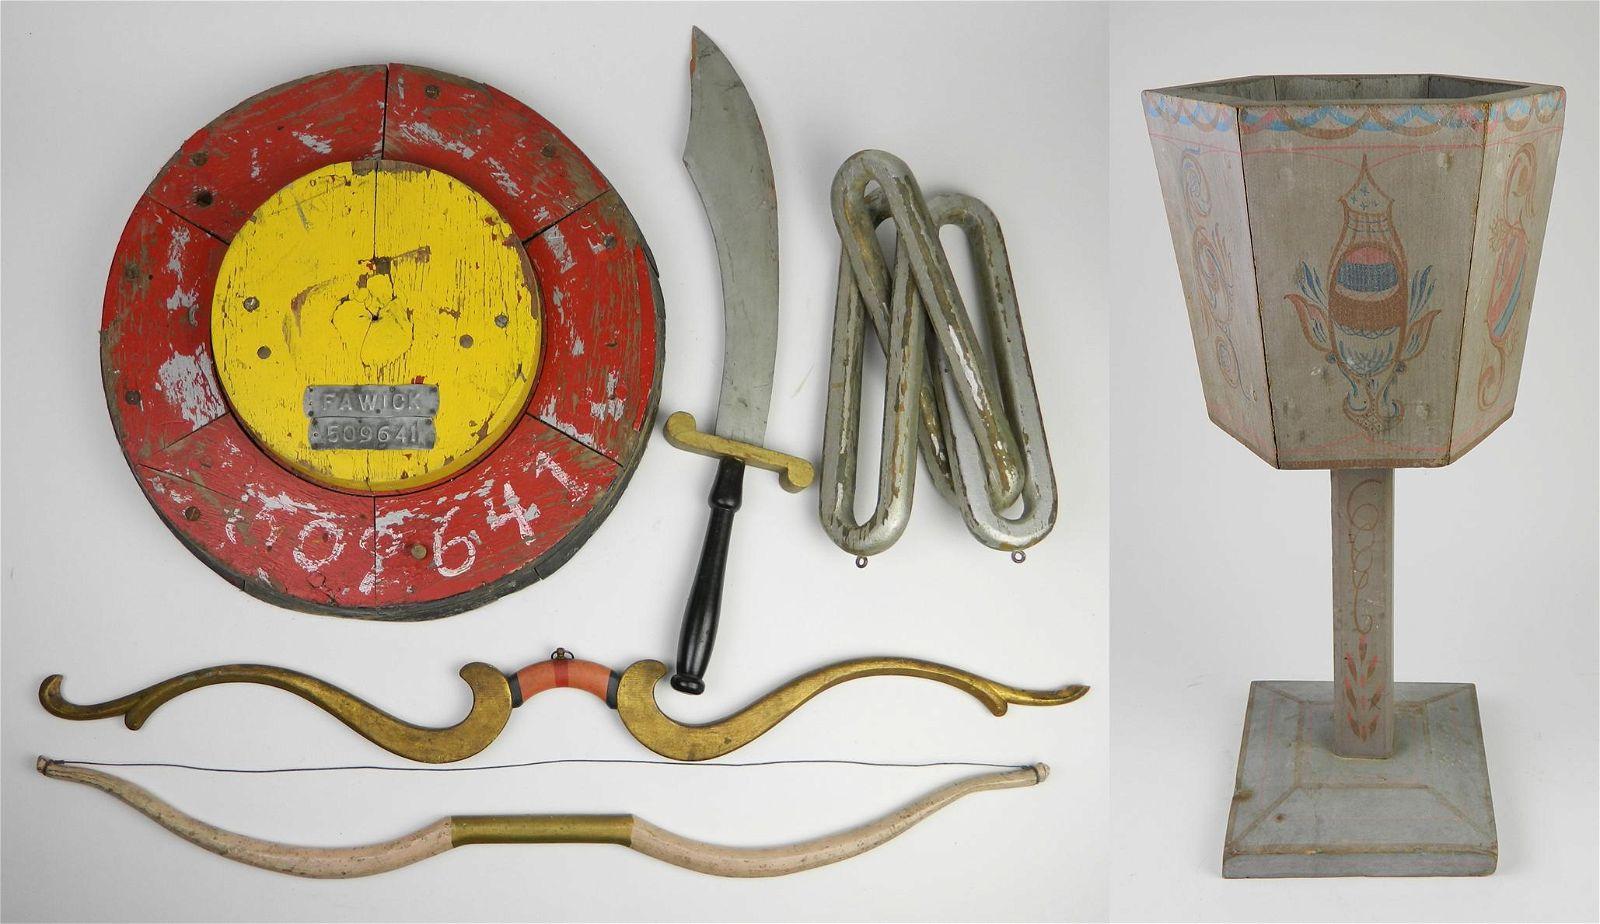 6 Carved folk art items